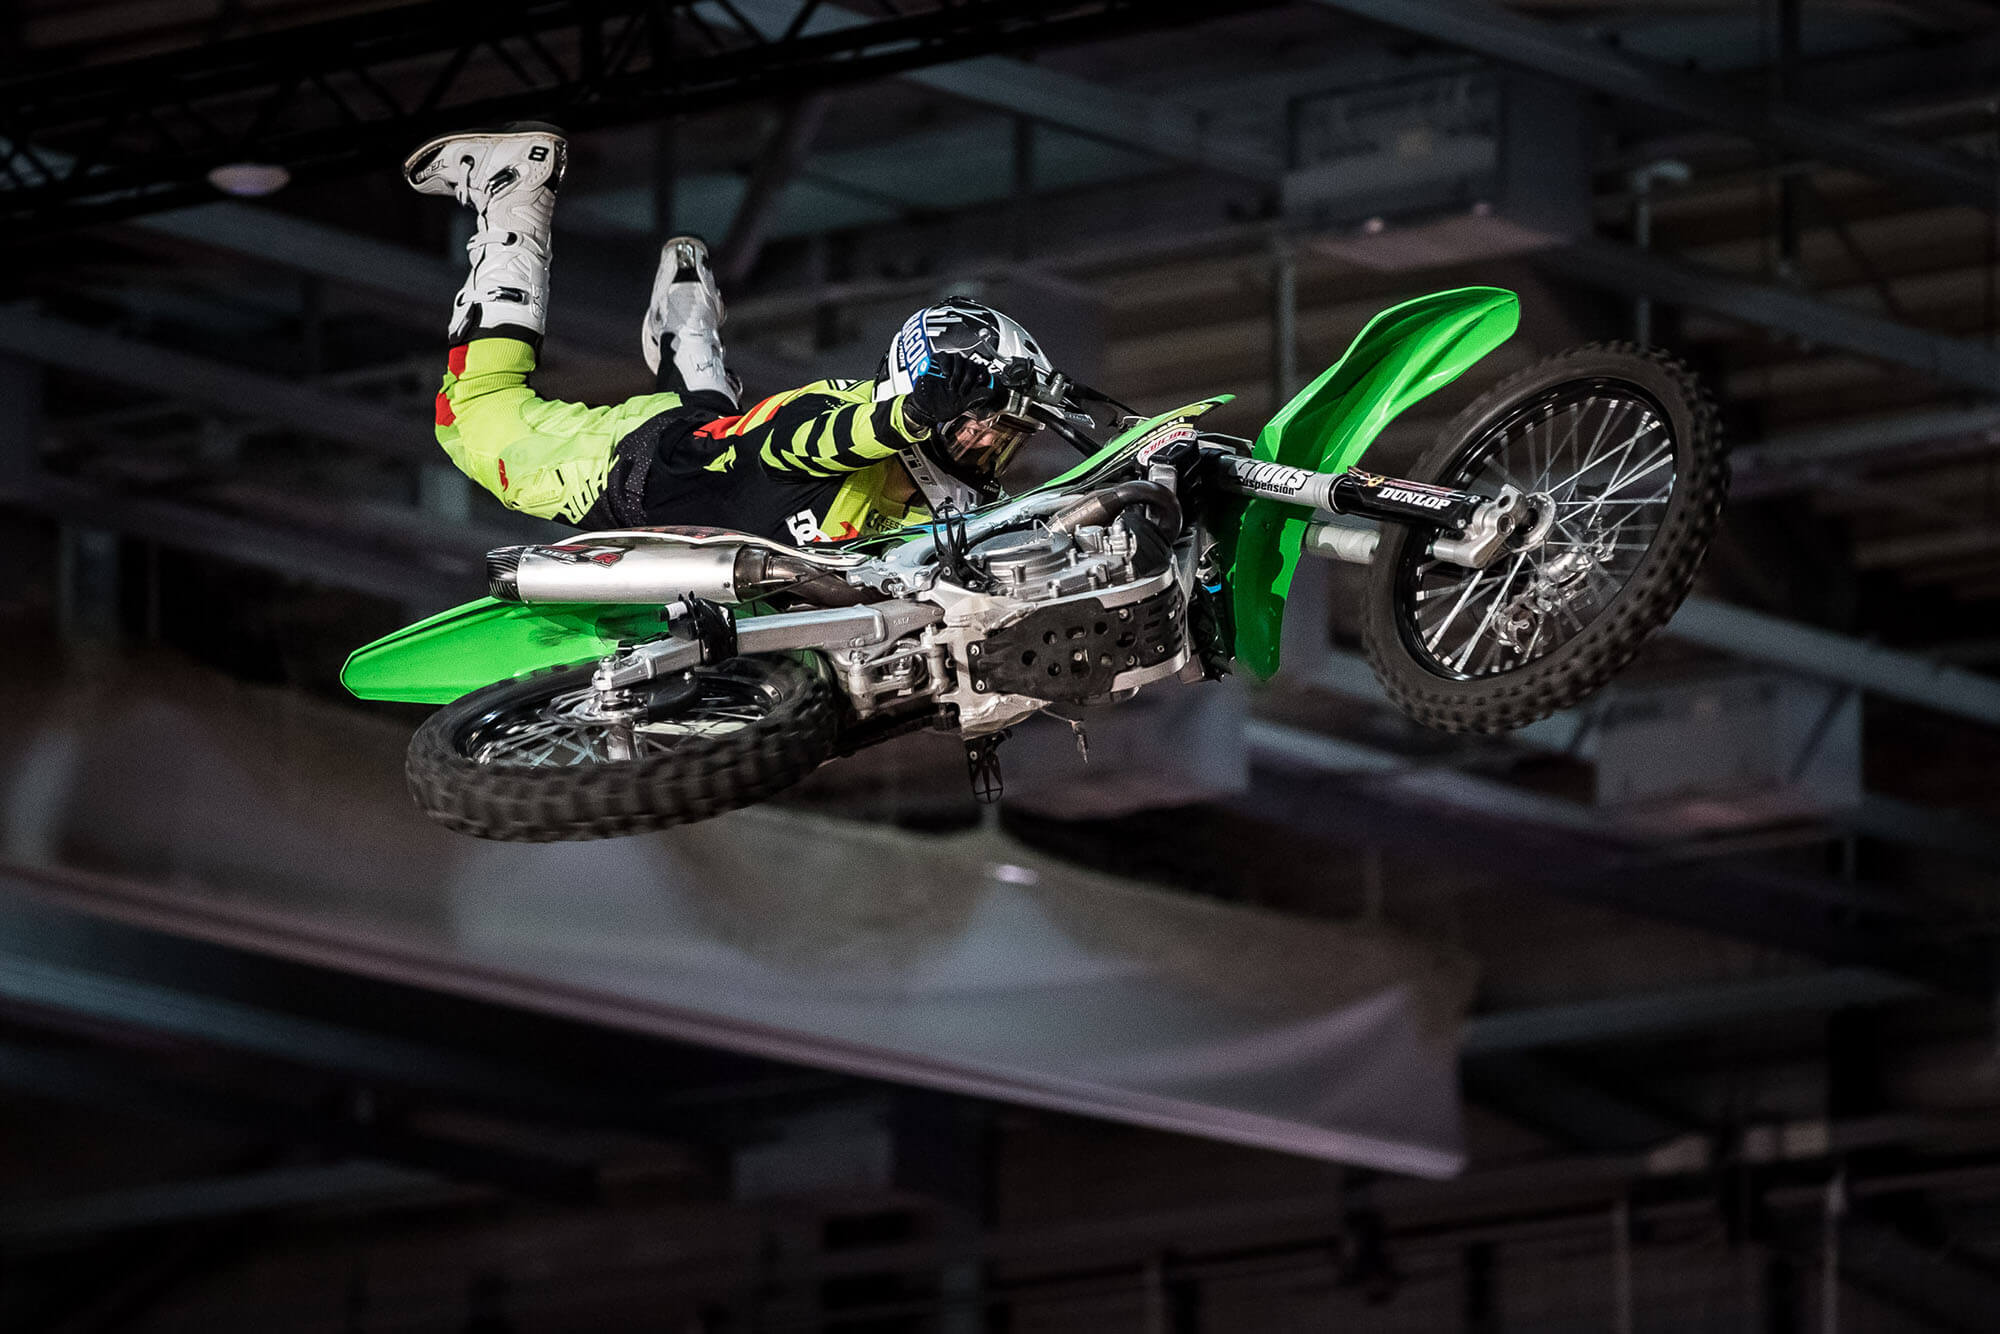 fmx freestyle motocross jamie squibb motocross sports photography sportfotografie masters of dirt flap photography fotograf philipp greindl photographer